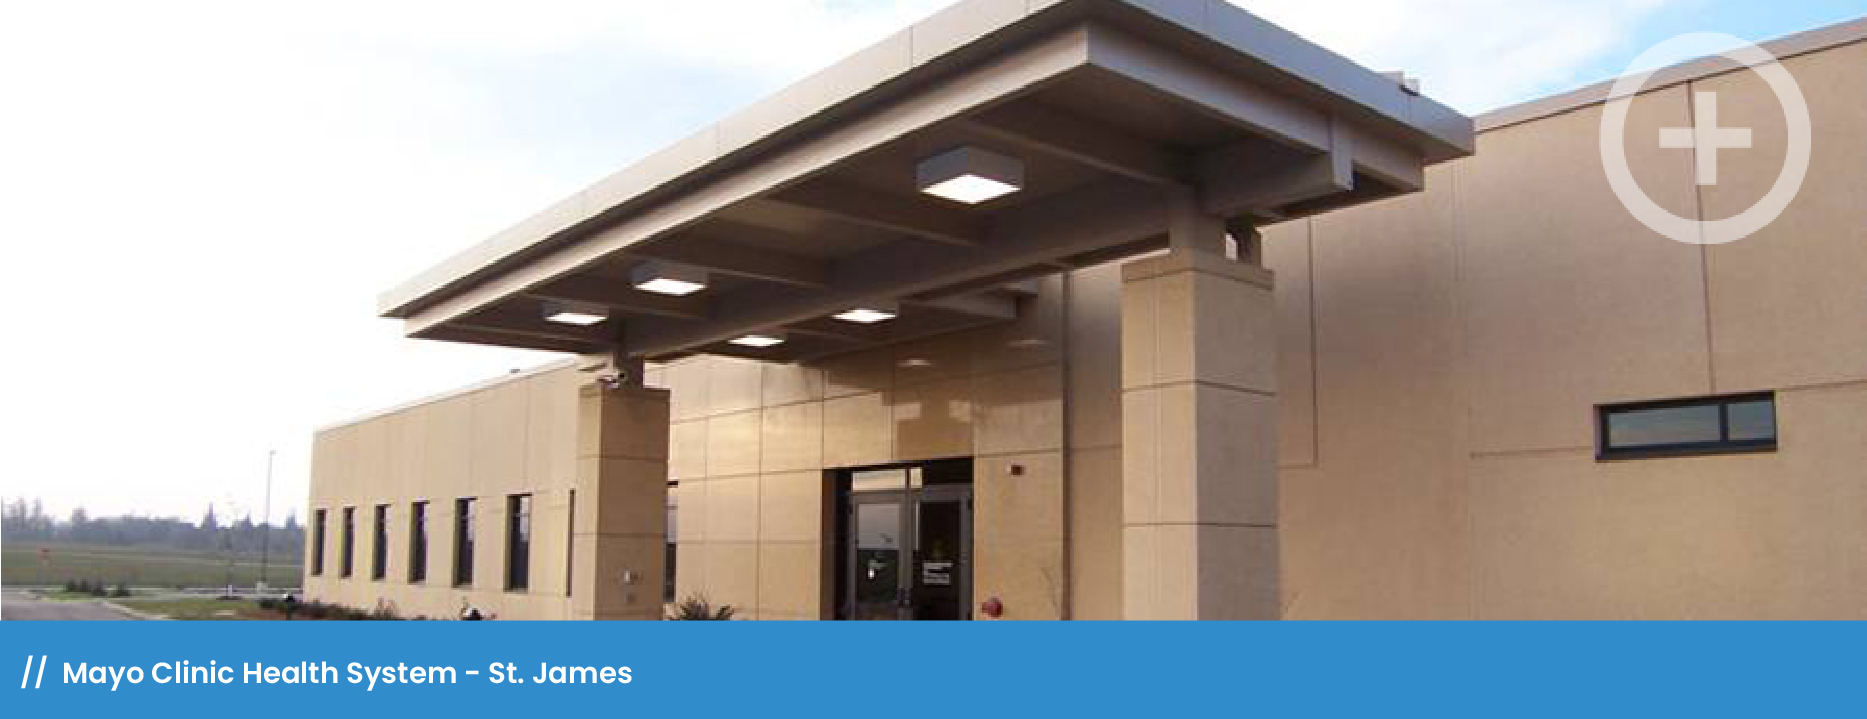 Yanik-Watermark_Mayo Clinic Health System - St. James